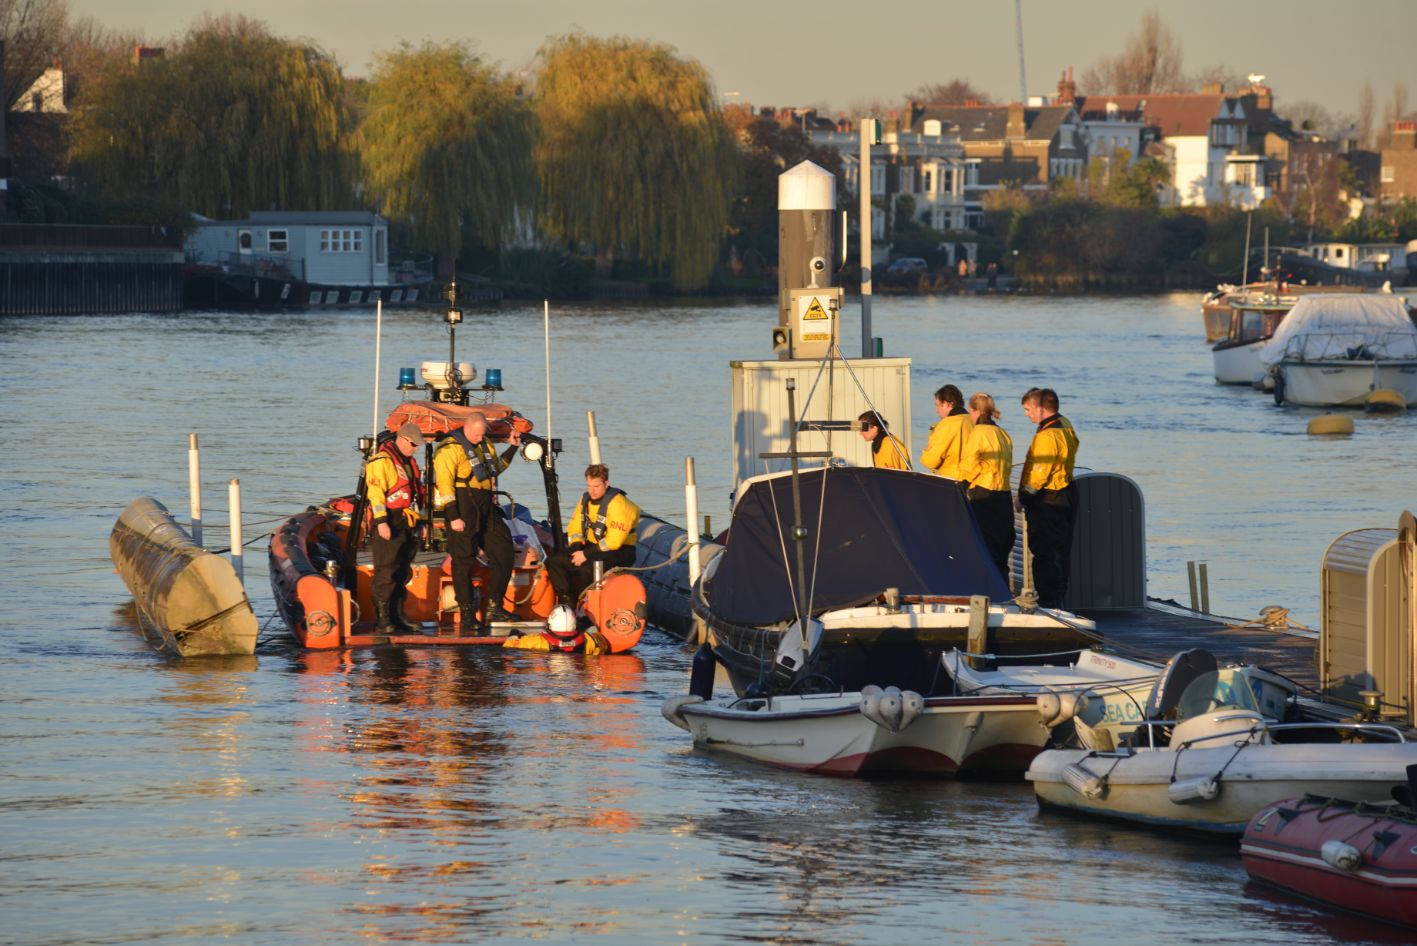 RNLI - 6.12.2014 - Winter rescue practice 2_web